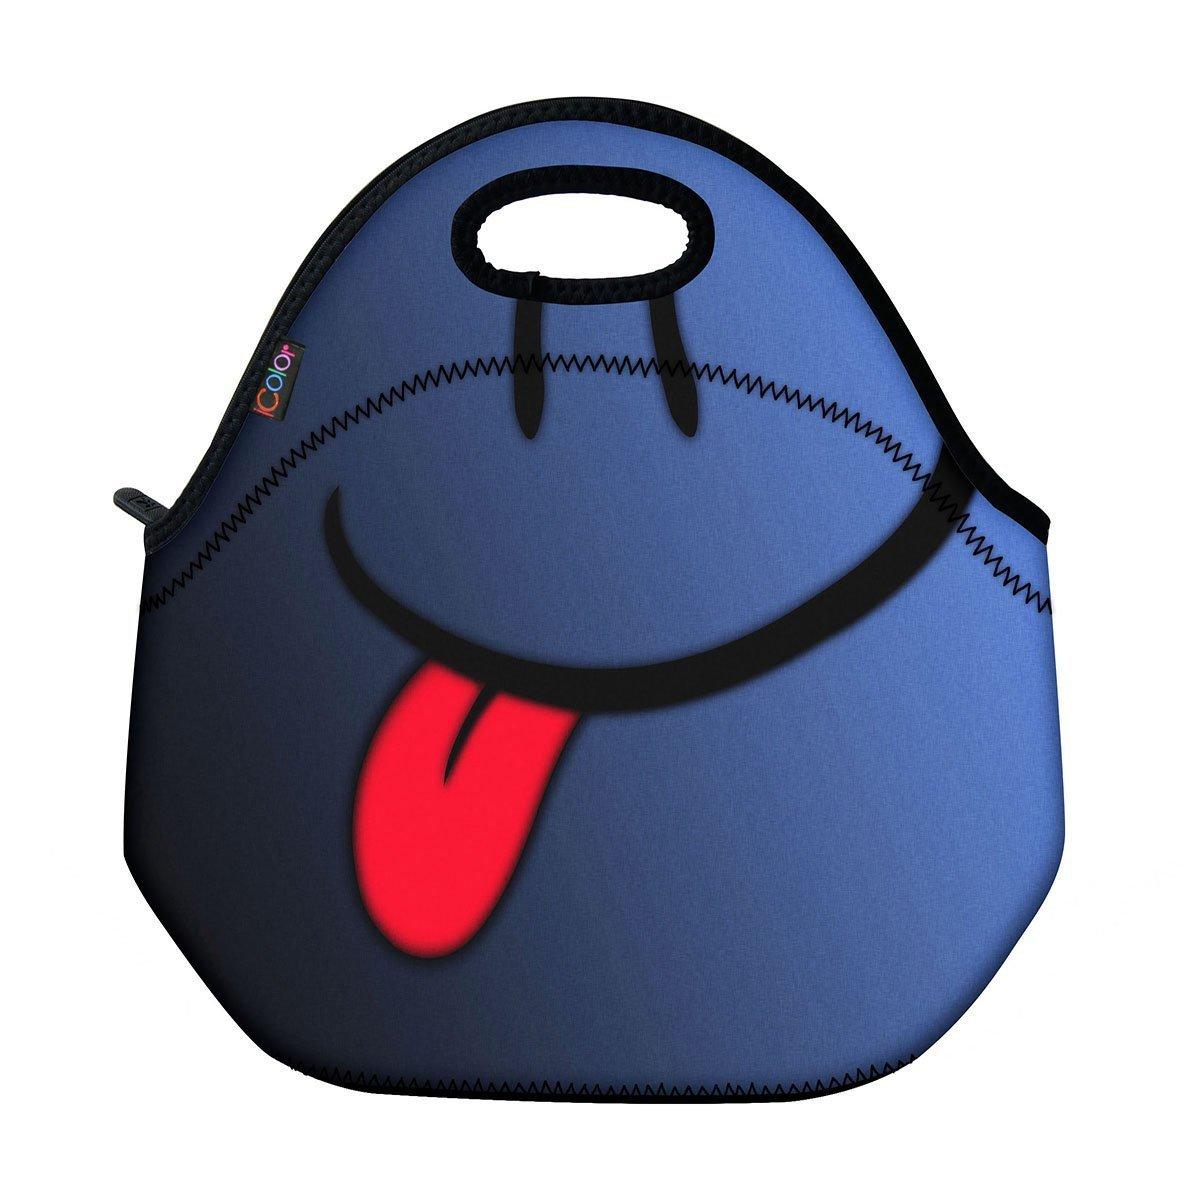 Gourmet Handbag Cooler warm Pouch Tote bag For School work Office